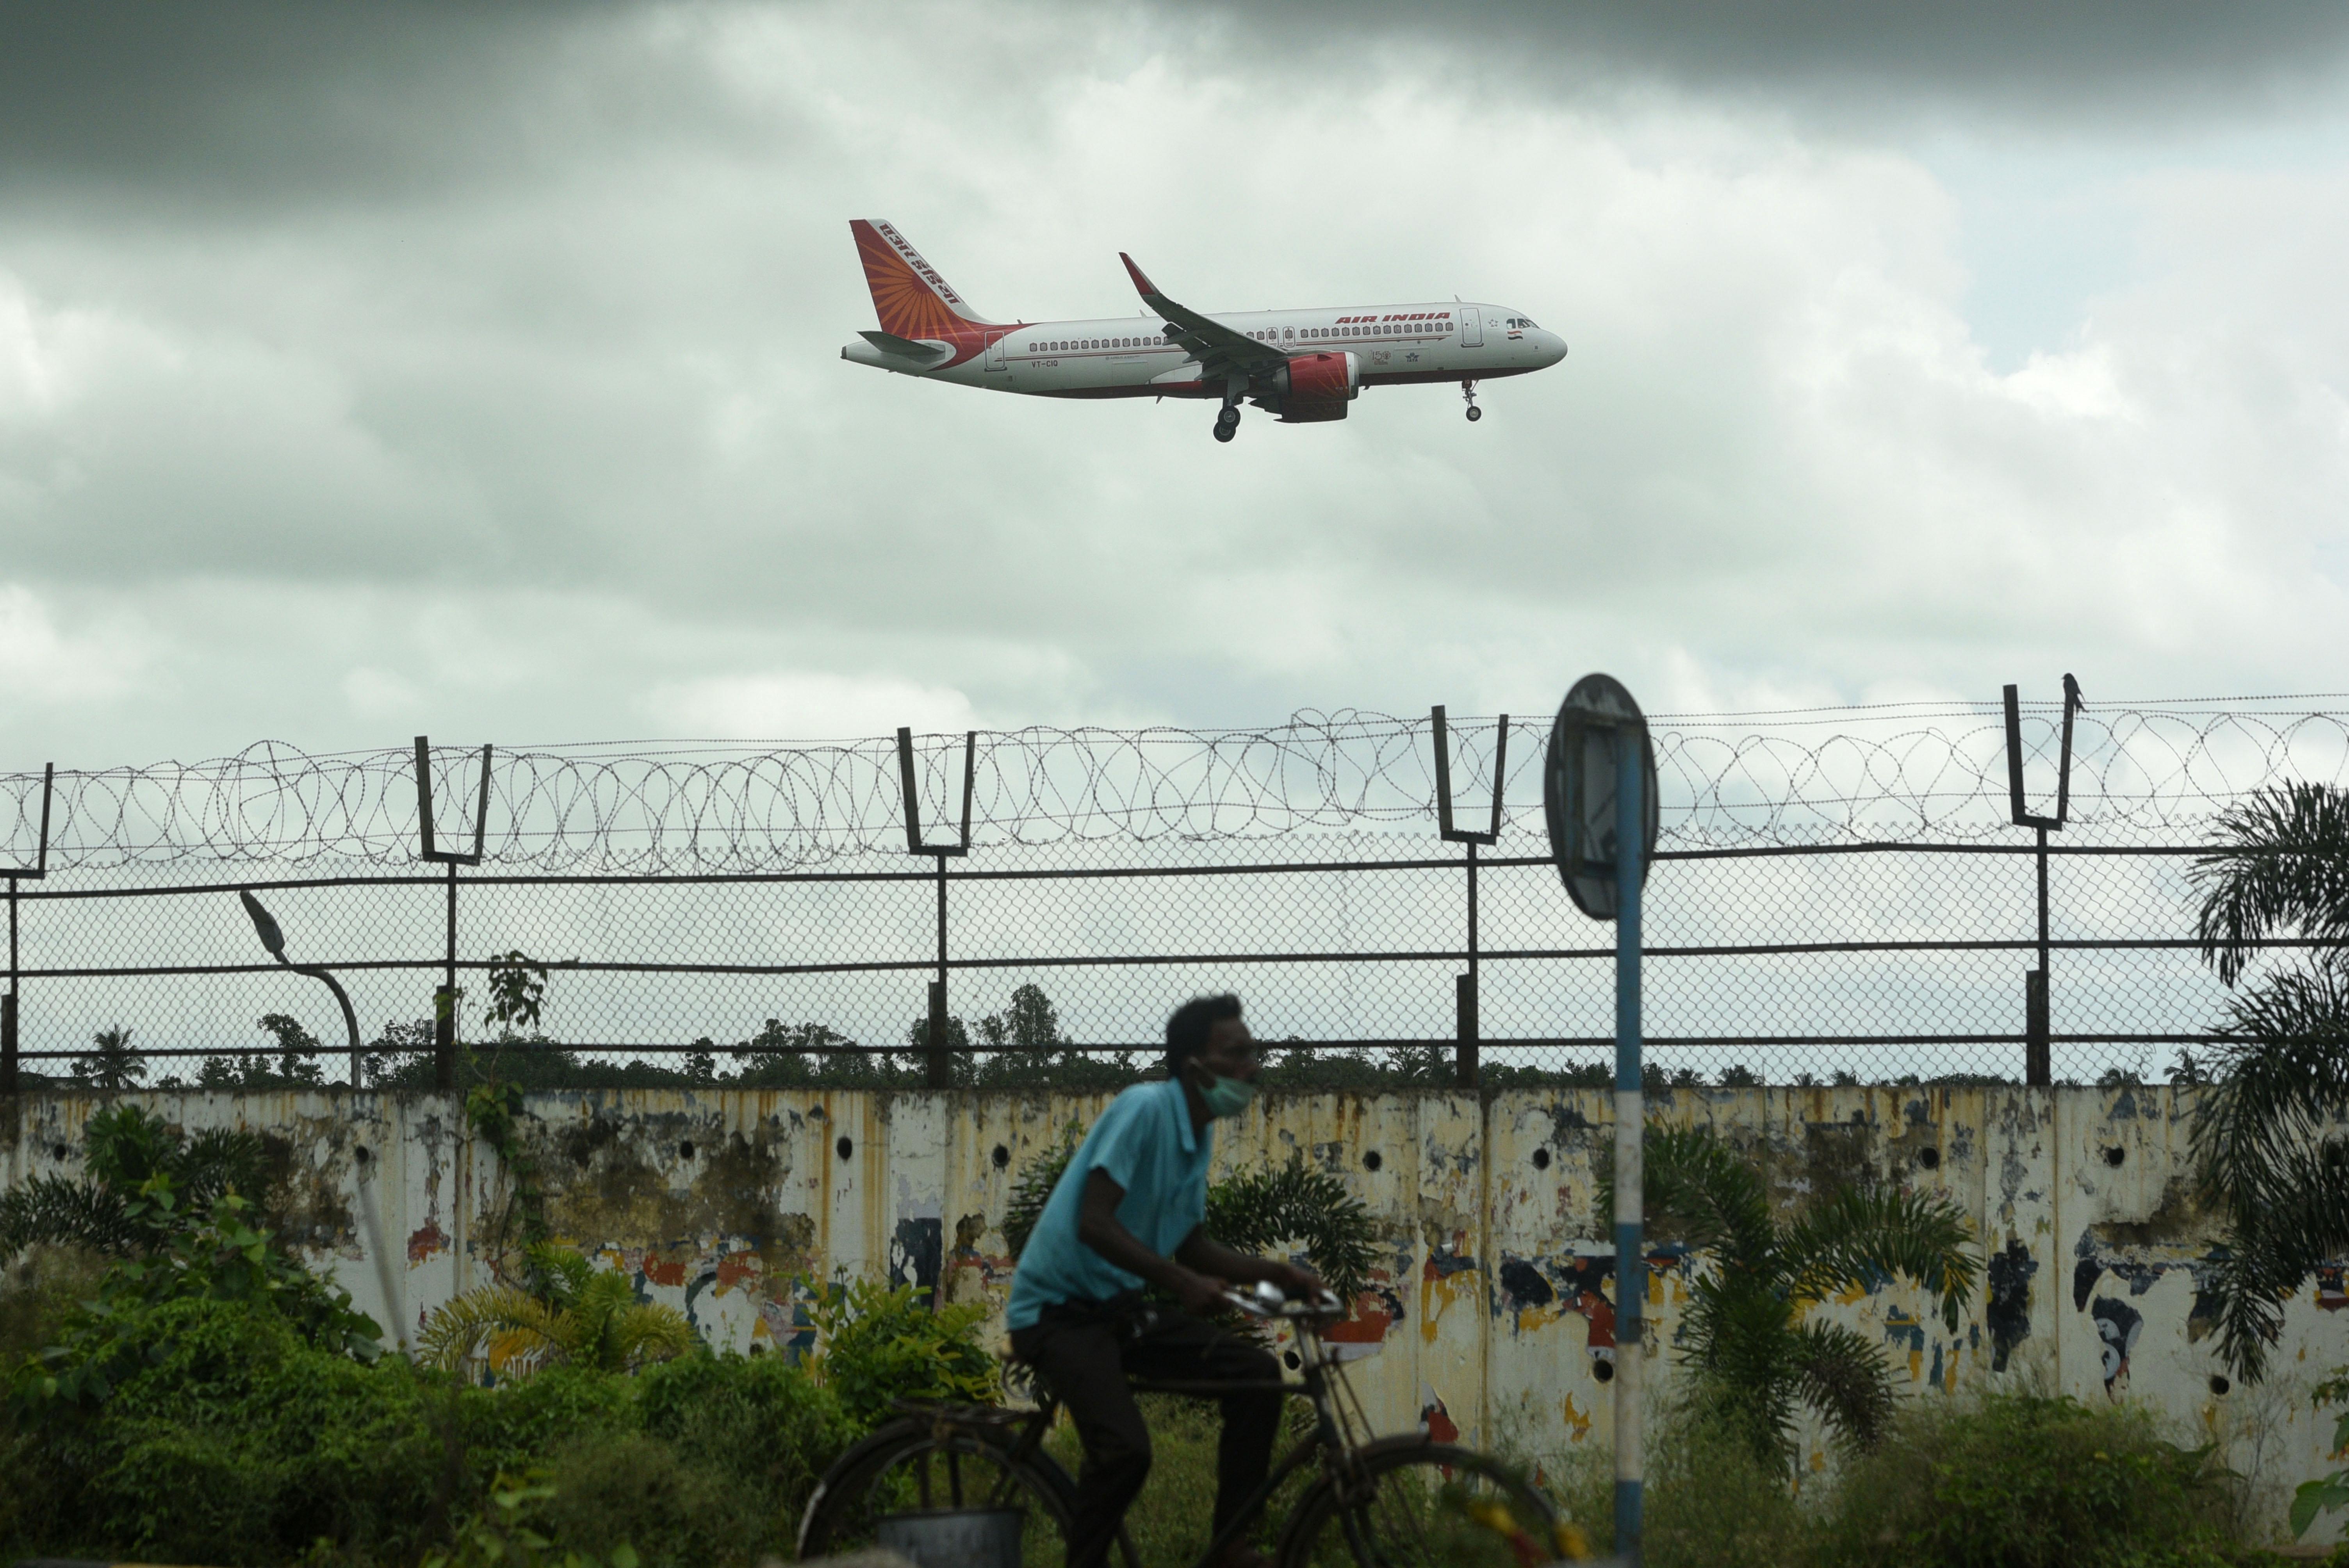 An airplane takes off from Netaji Subhas Chandra Bose International Airport in Kolkata, India, on July 5.